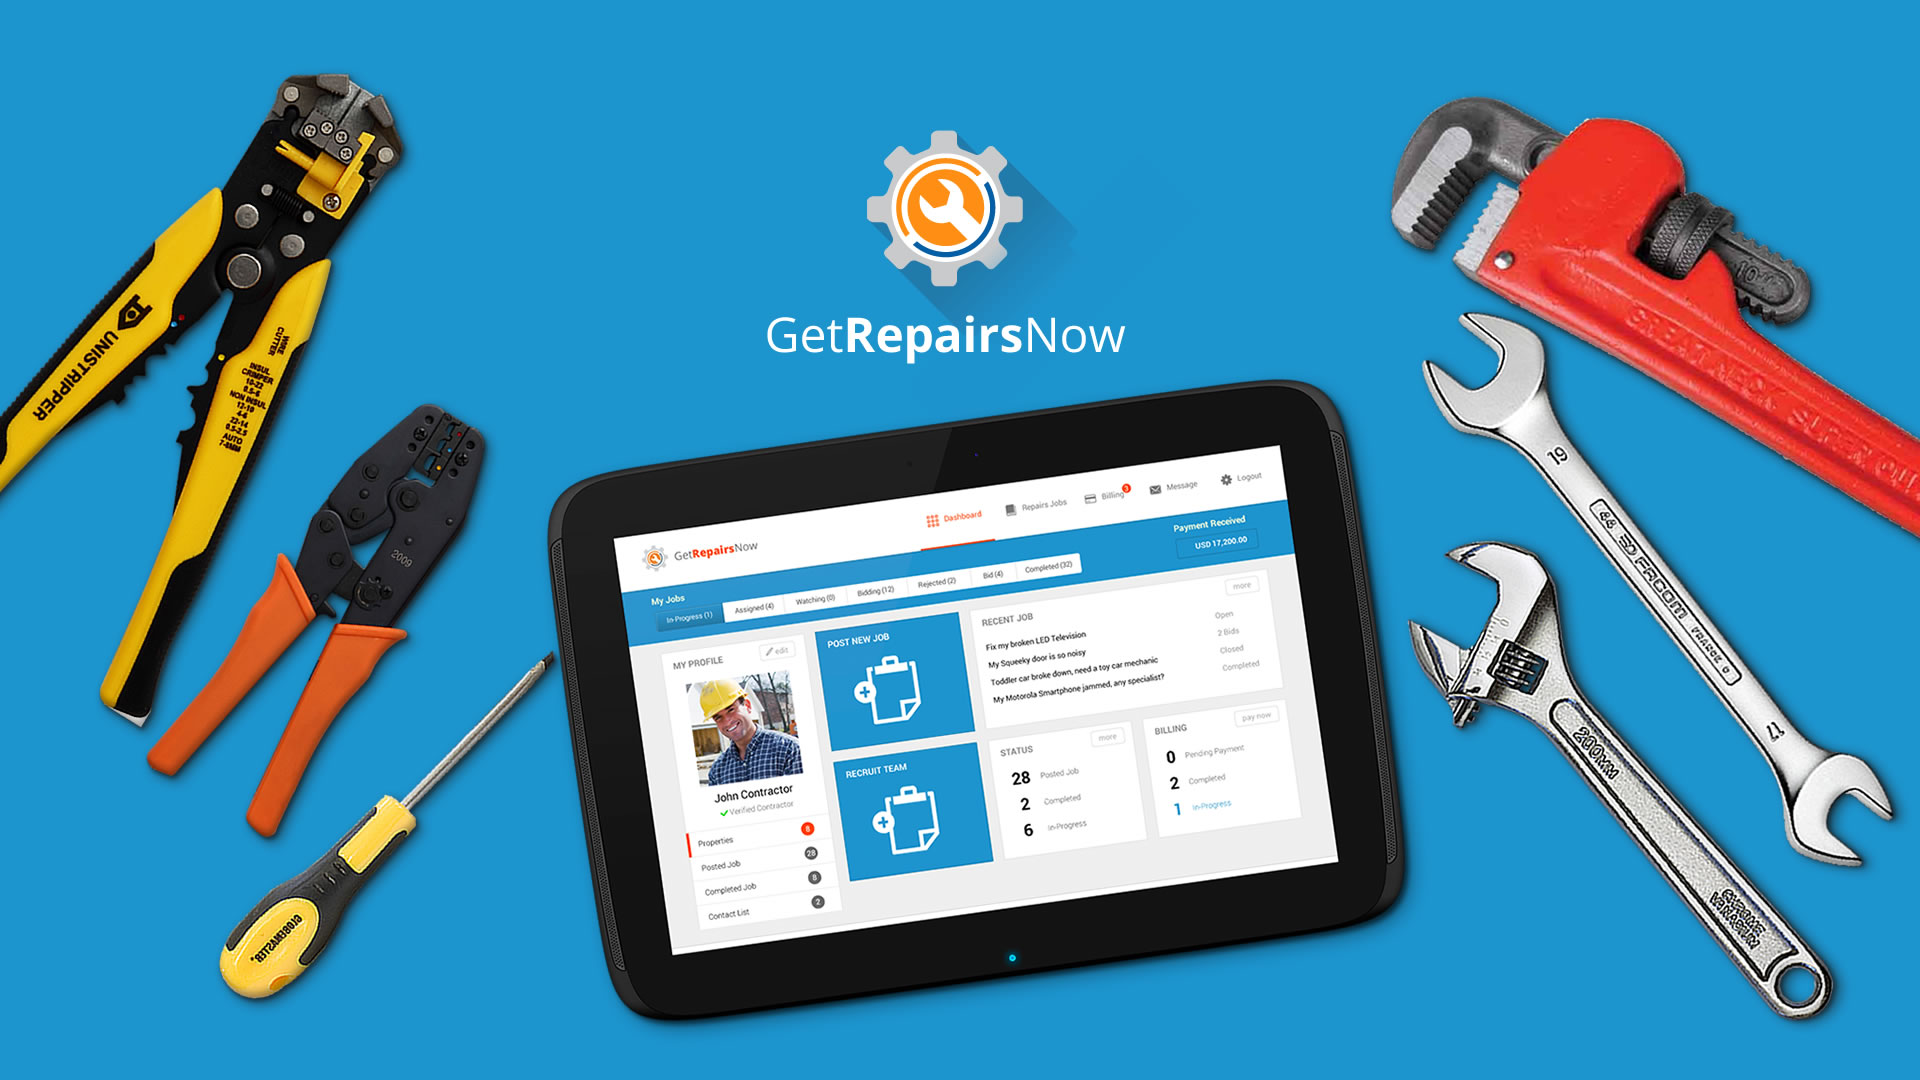 getrepairsnow-dashboard-design-on-tablet-hd